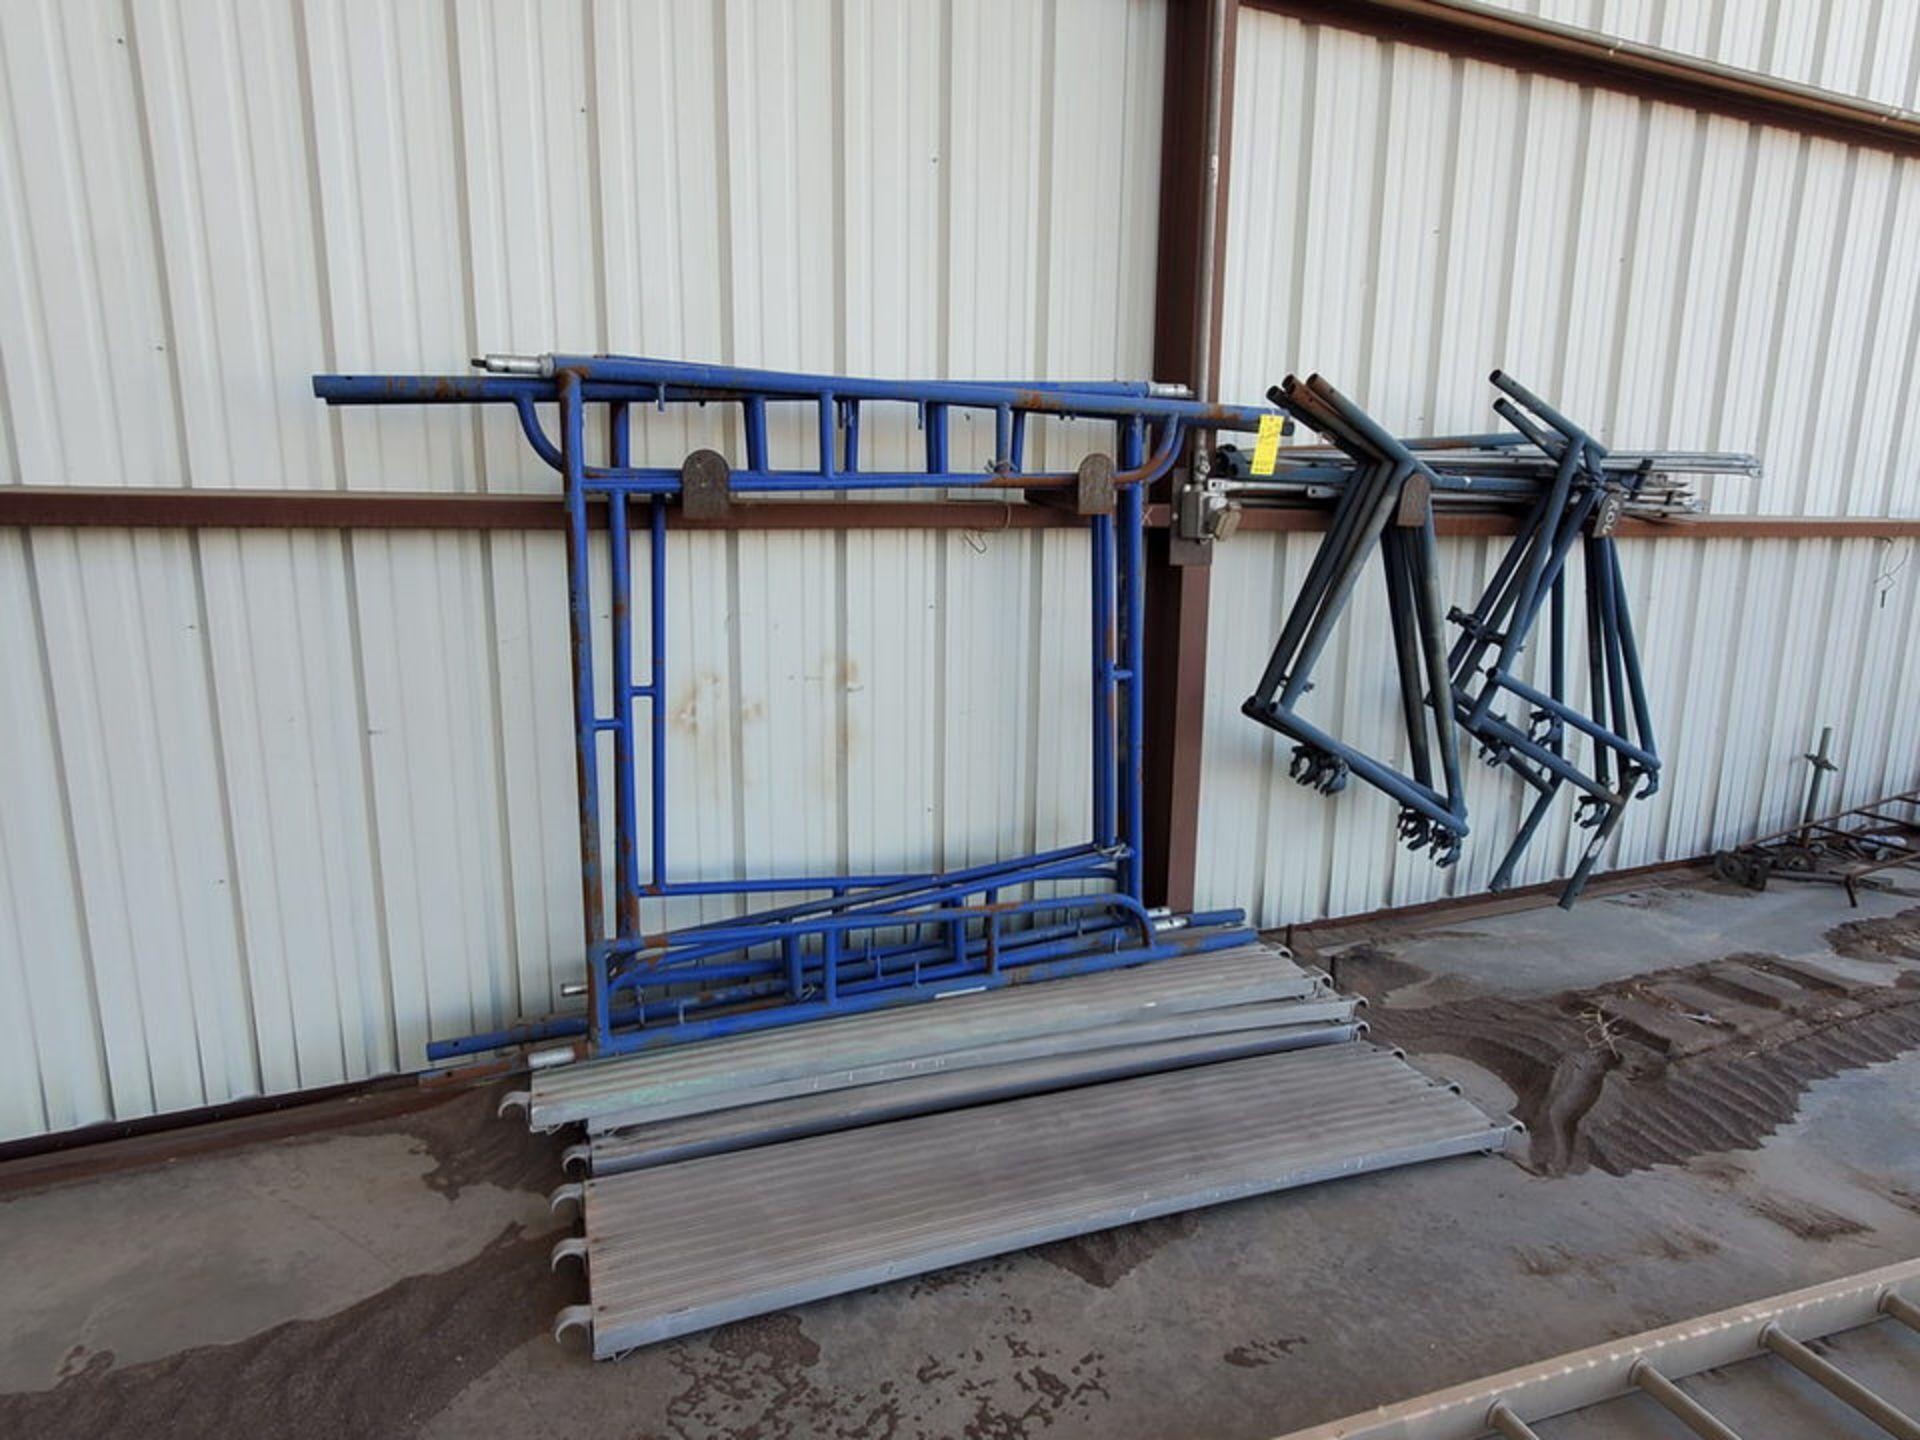 Scaffold W' 16' Fixed Alum. Ladder - Image 3 of 10